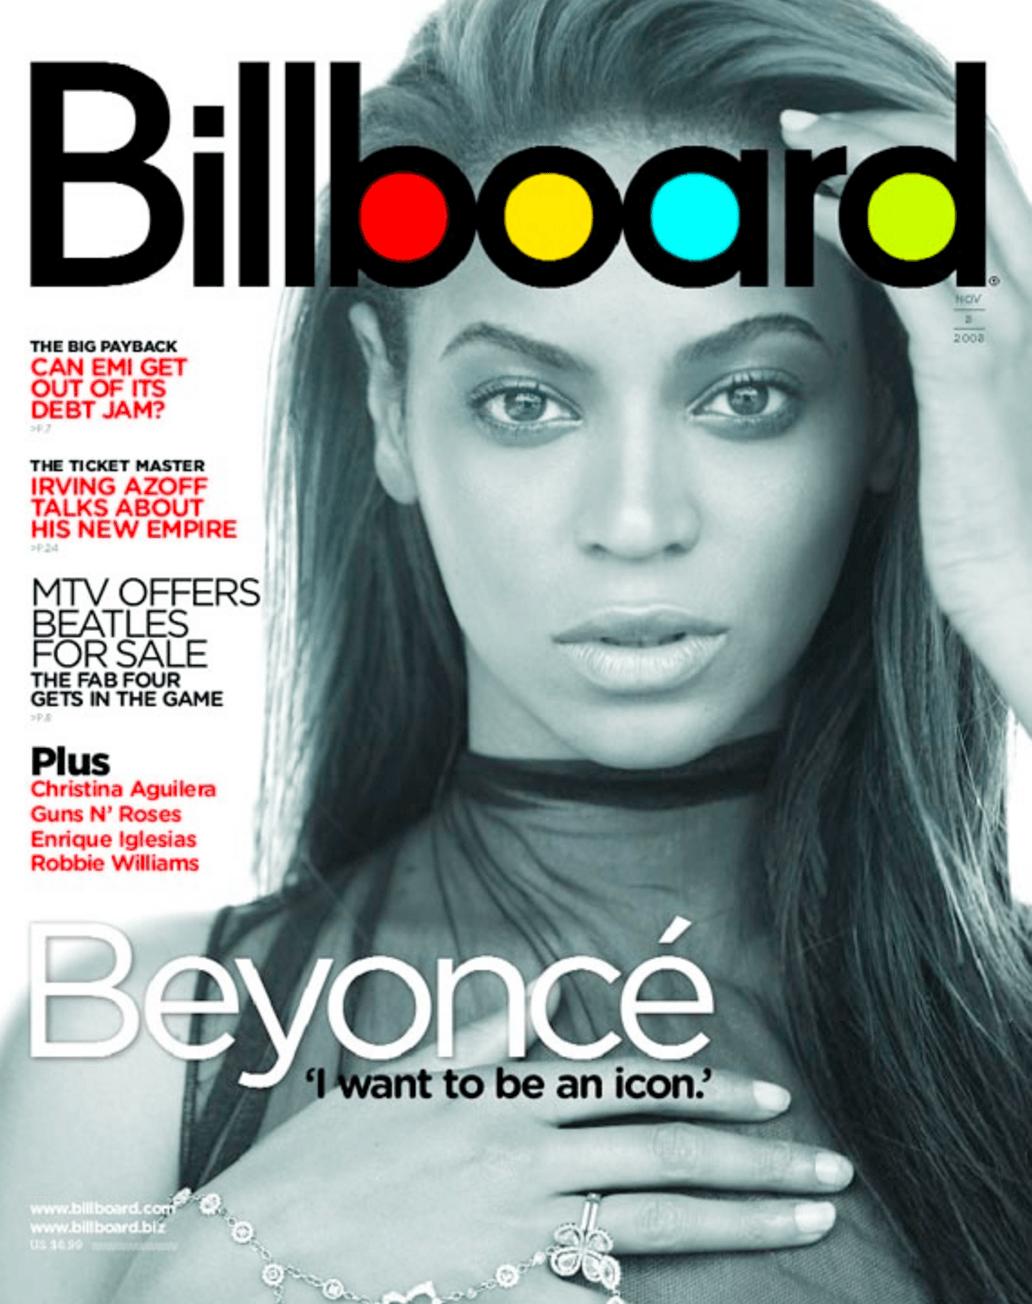 billboard magazine subscription - 576×727